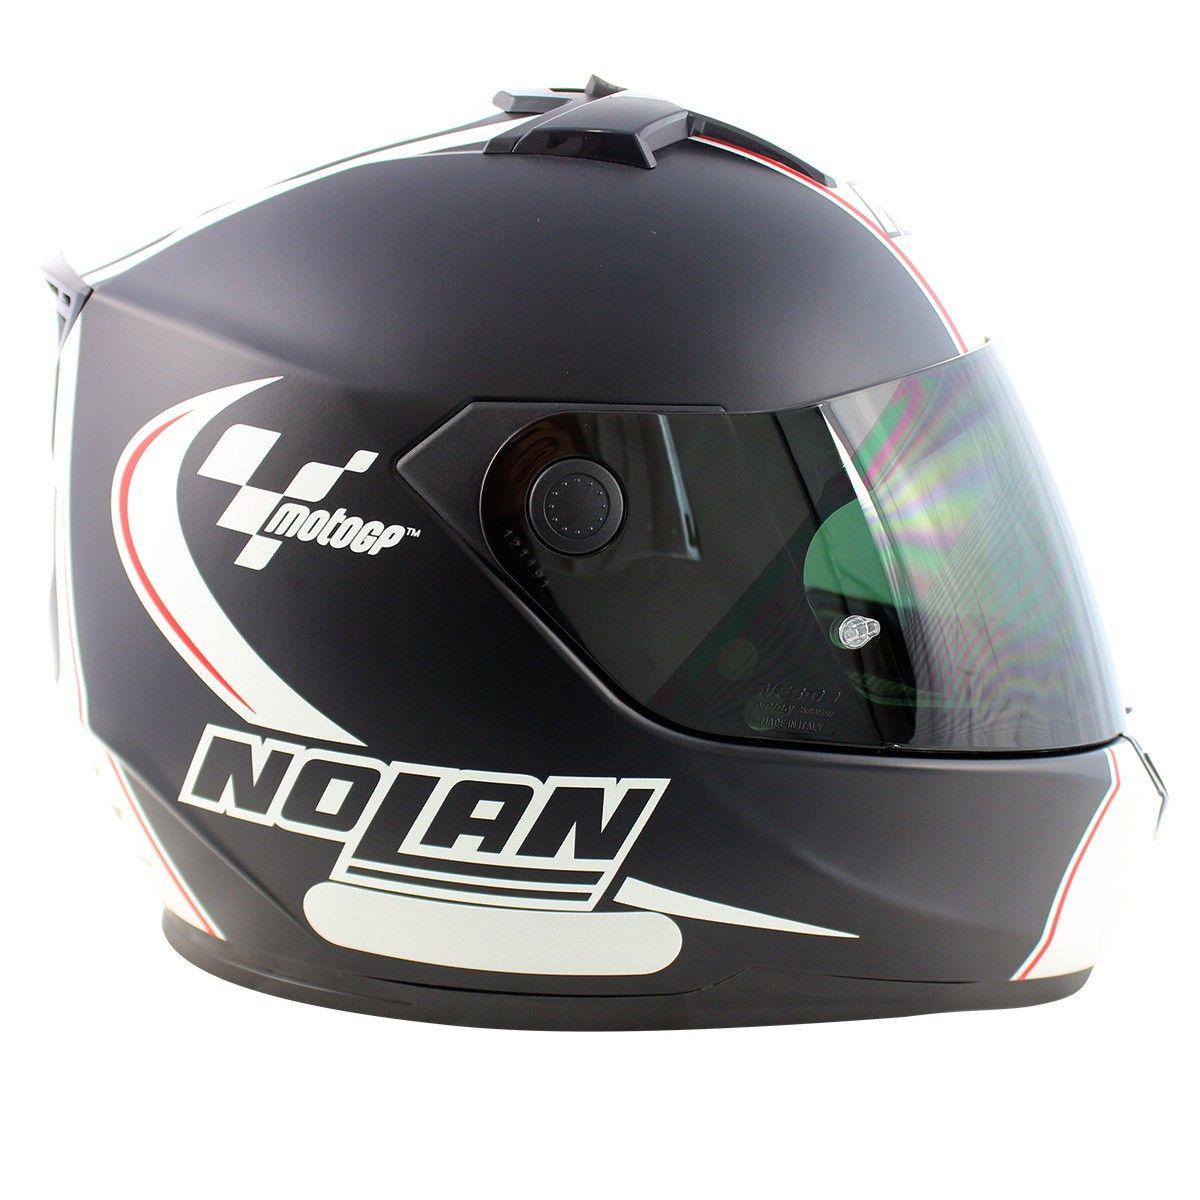 Capacete Nolan N64 MotoGP Flat Black c/ Branco - GANHE TOUCA BALACLAVA